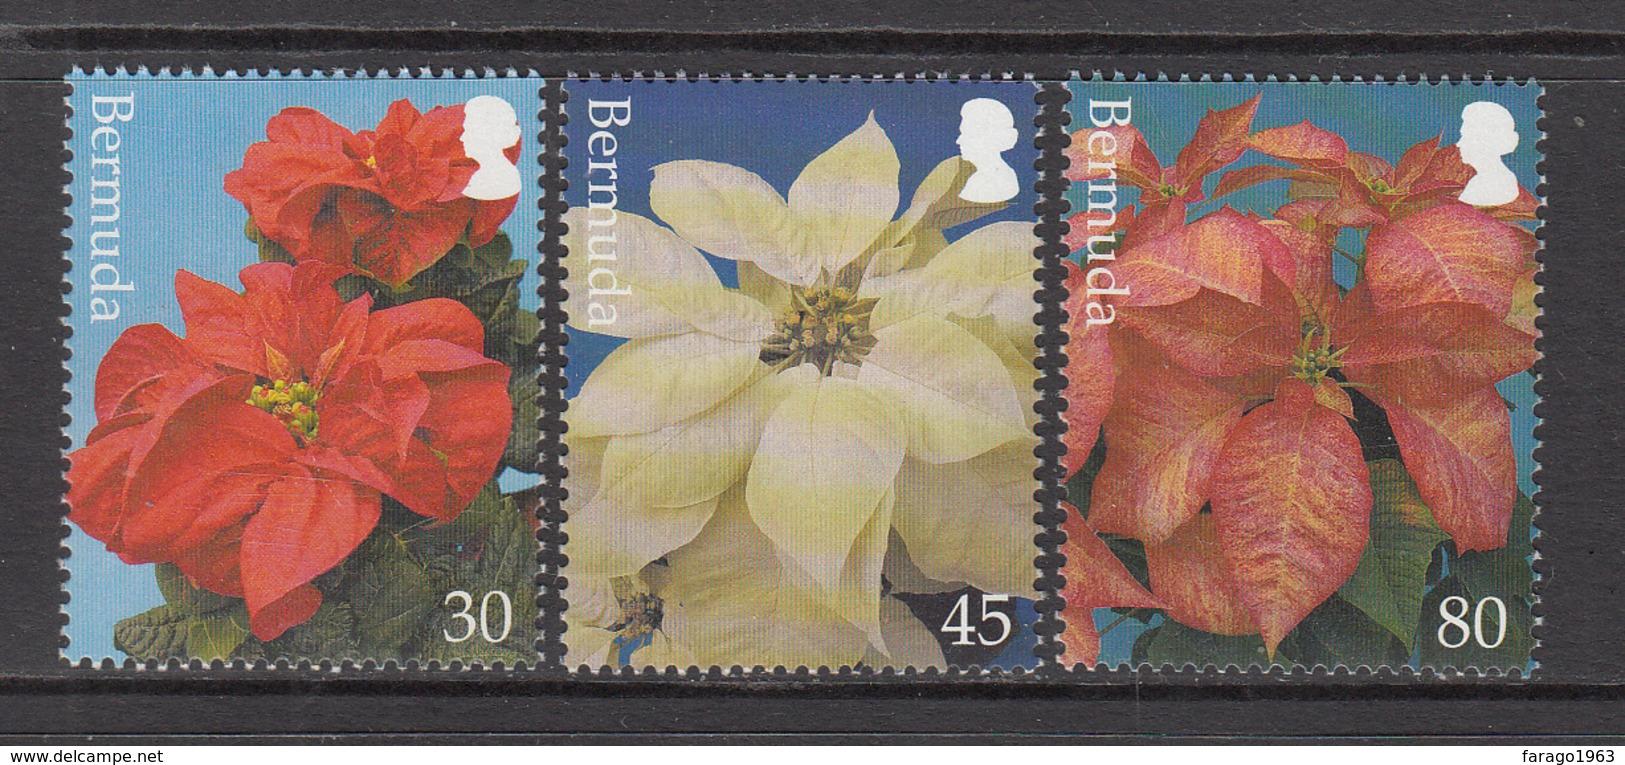 2003 Bermuda Pointsetta Flowers Christmas Noel  Complete Set Of 3 MNH - Bermuda